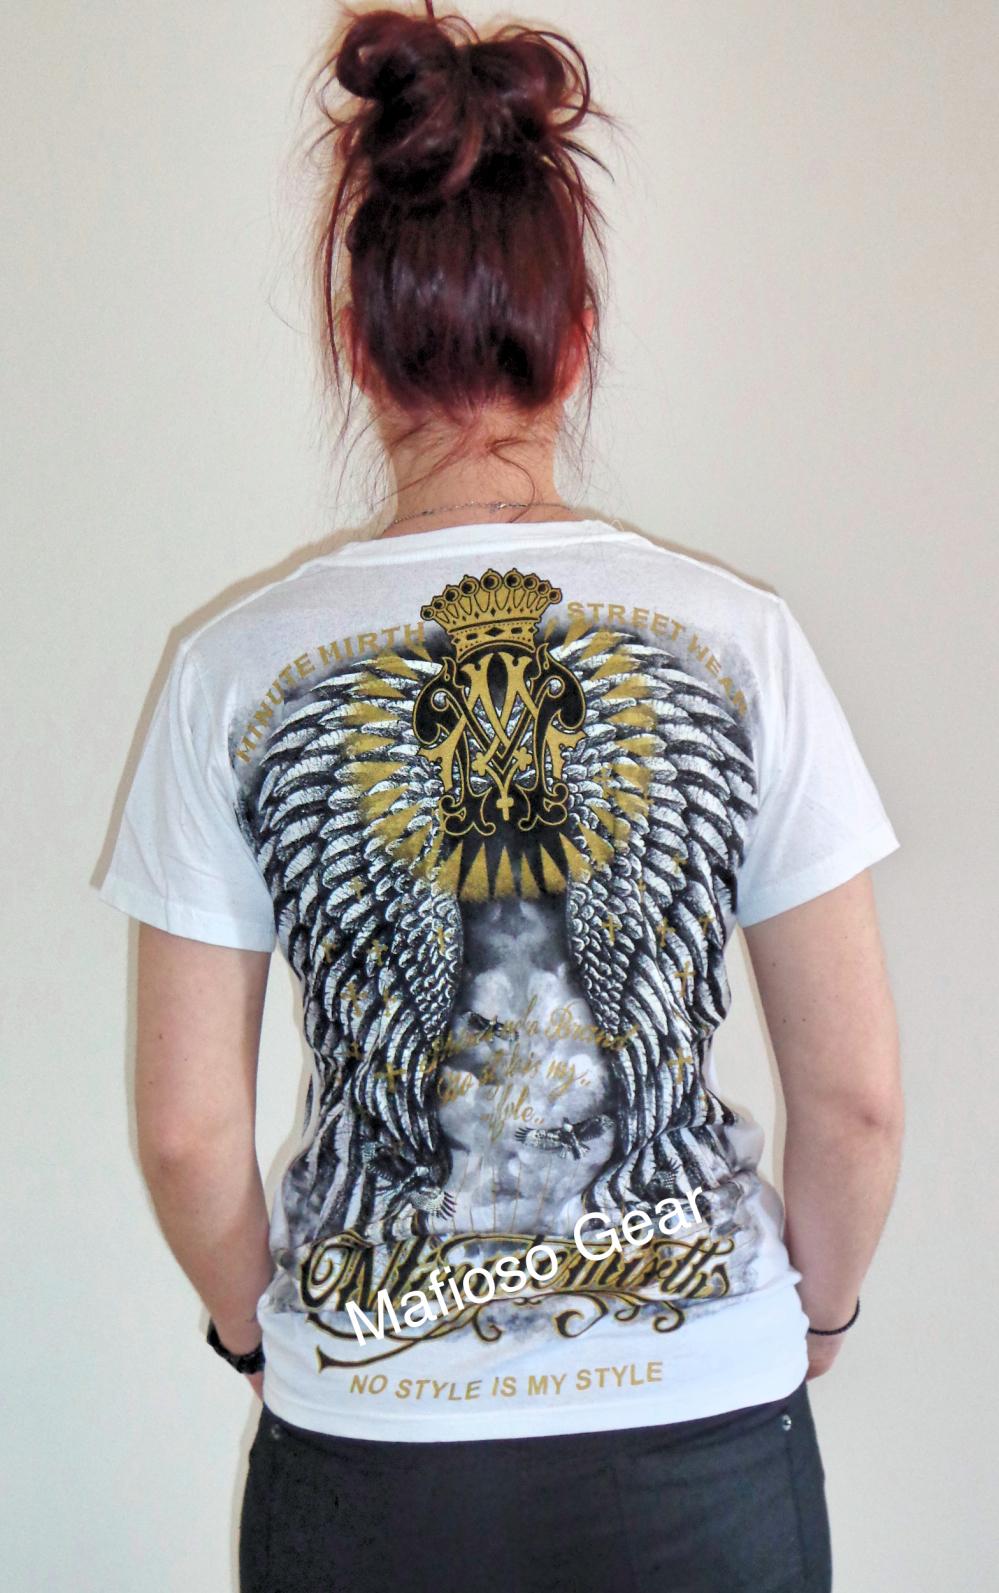 womans_burning_heart_t_shirt_unisex__t_shirts_5.jpg